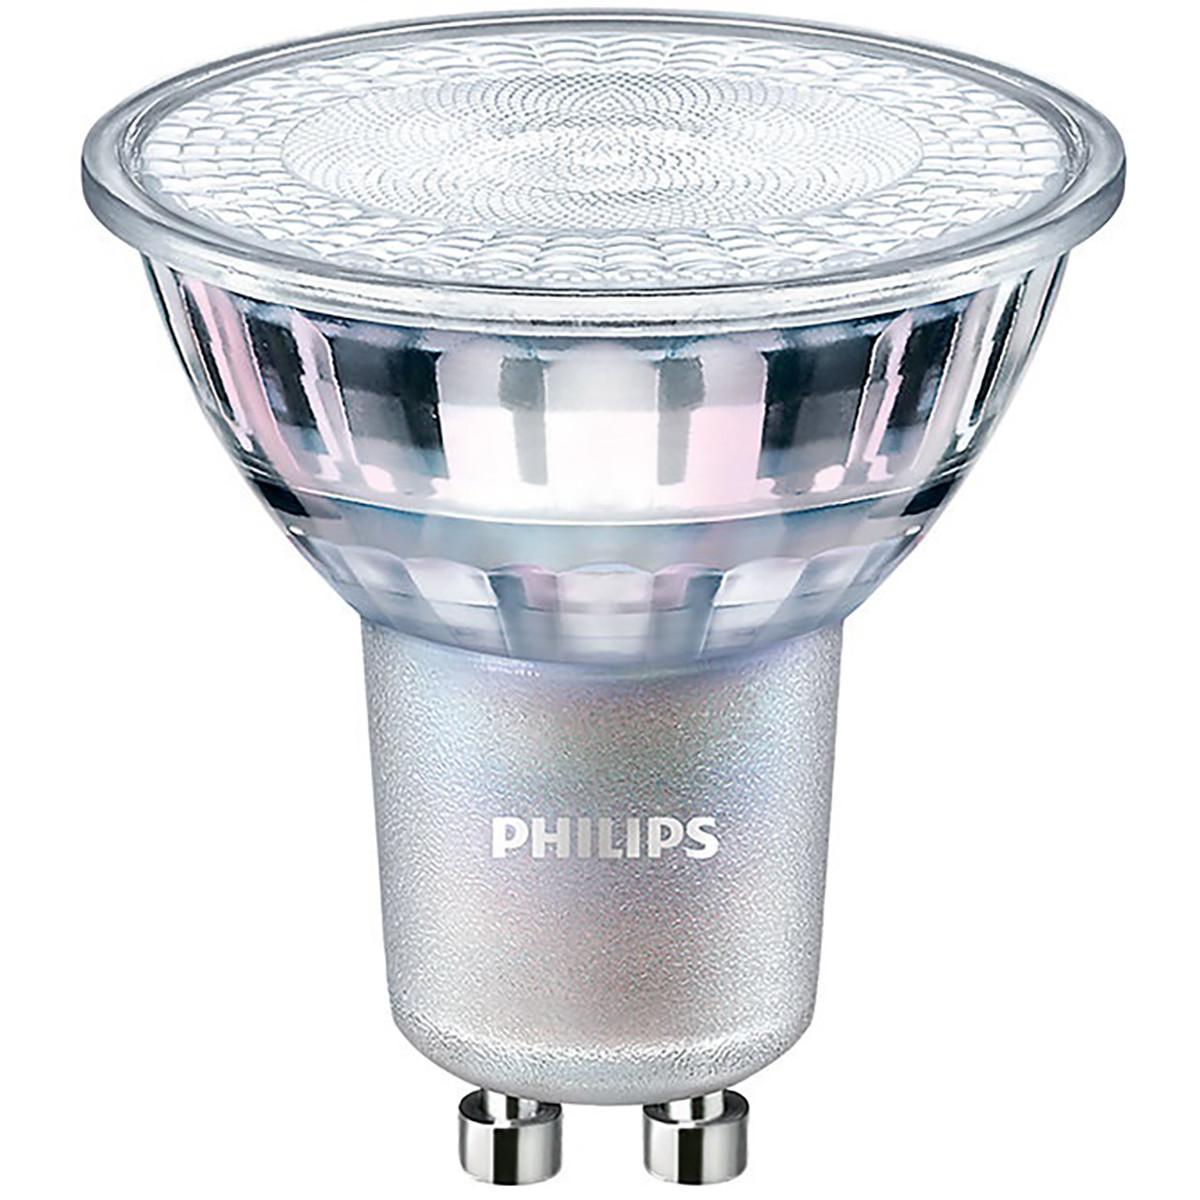 PHILIPS - LED Spot - MASTER 927 36D VLE - GU10 Fitting - DimTone Dimbaar - 4.9W - Warm Wit 2200K-270